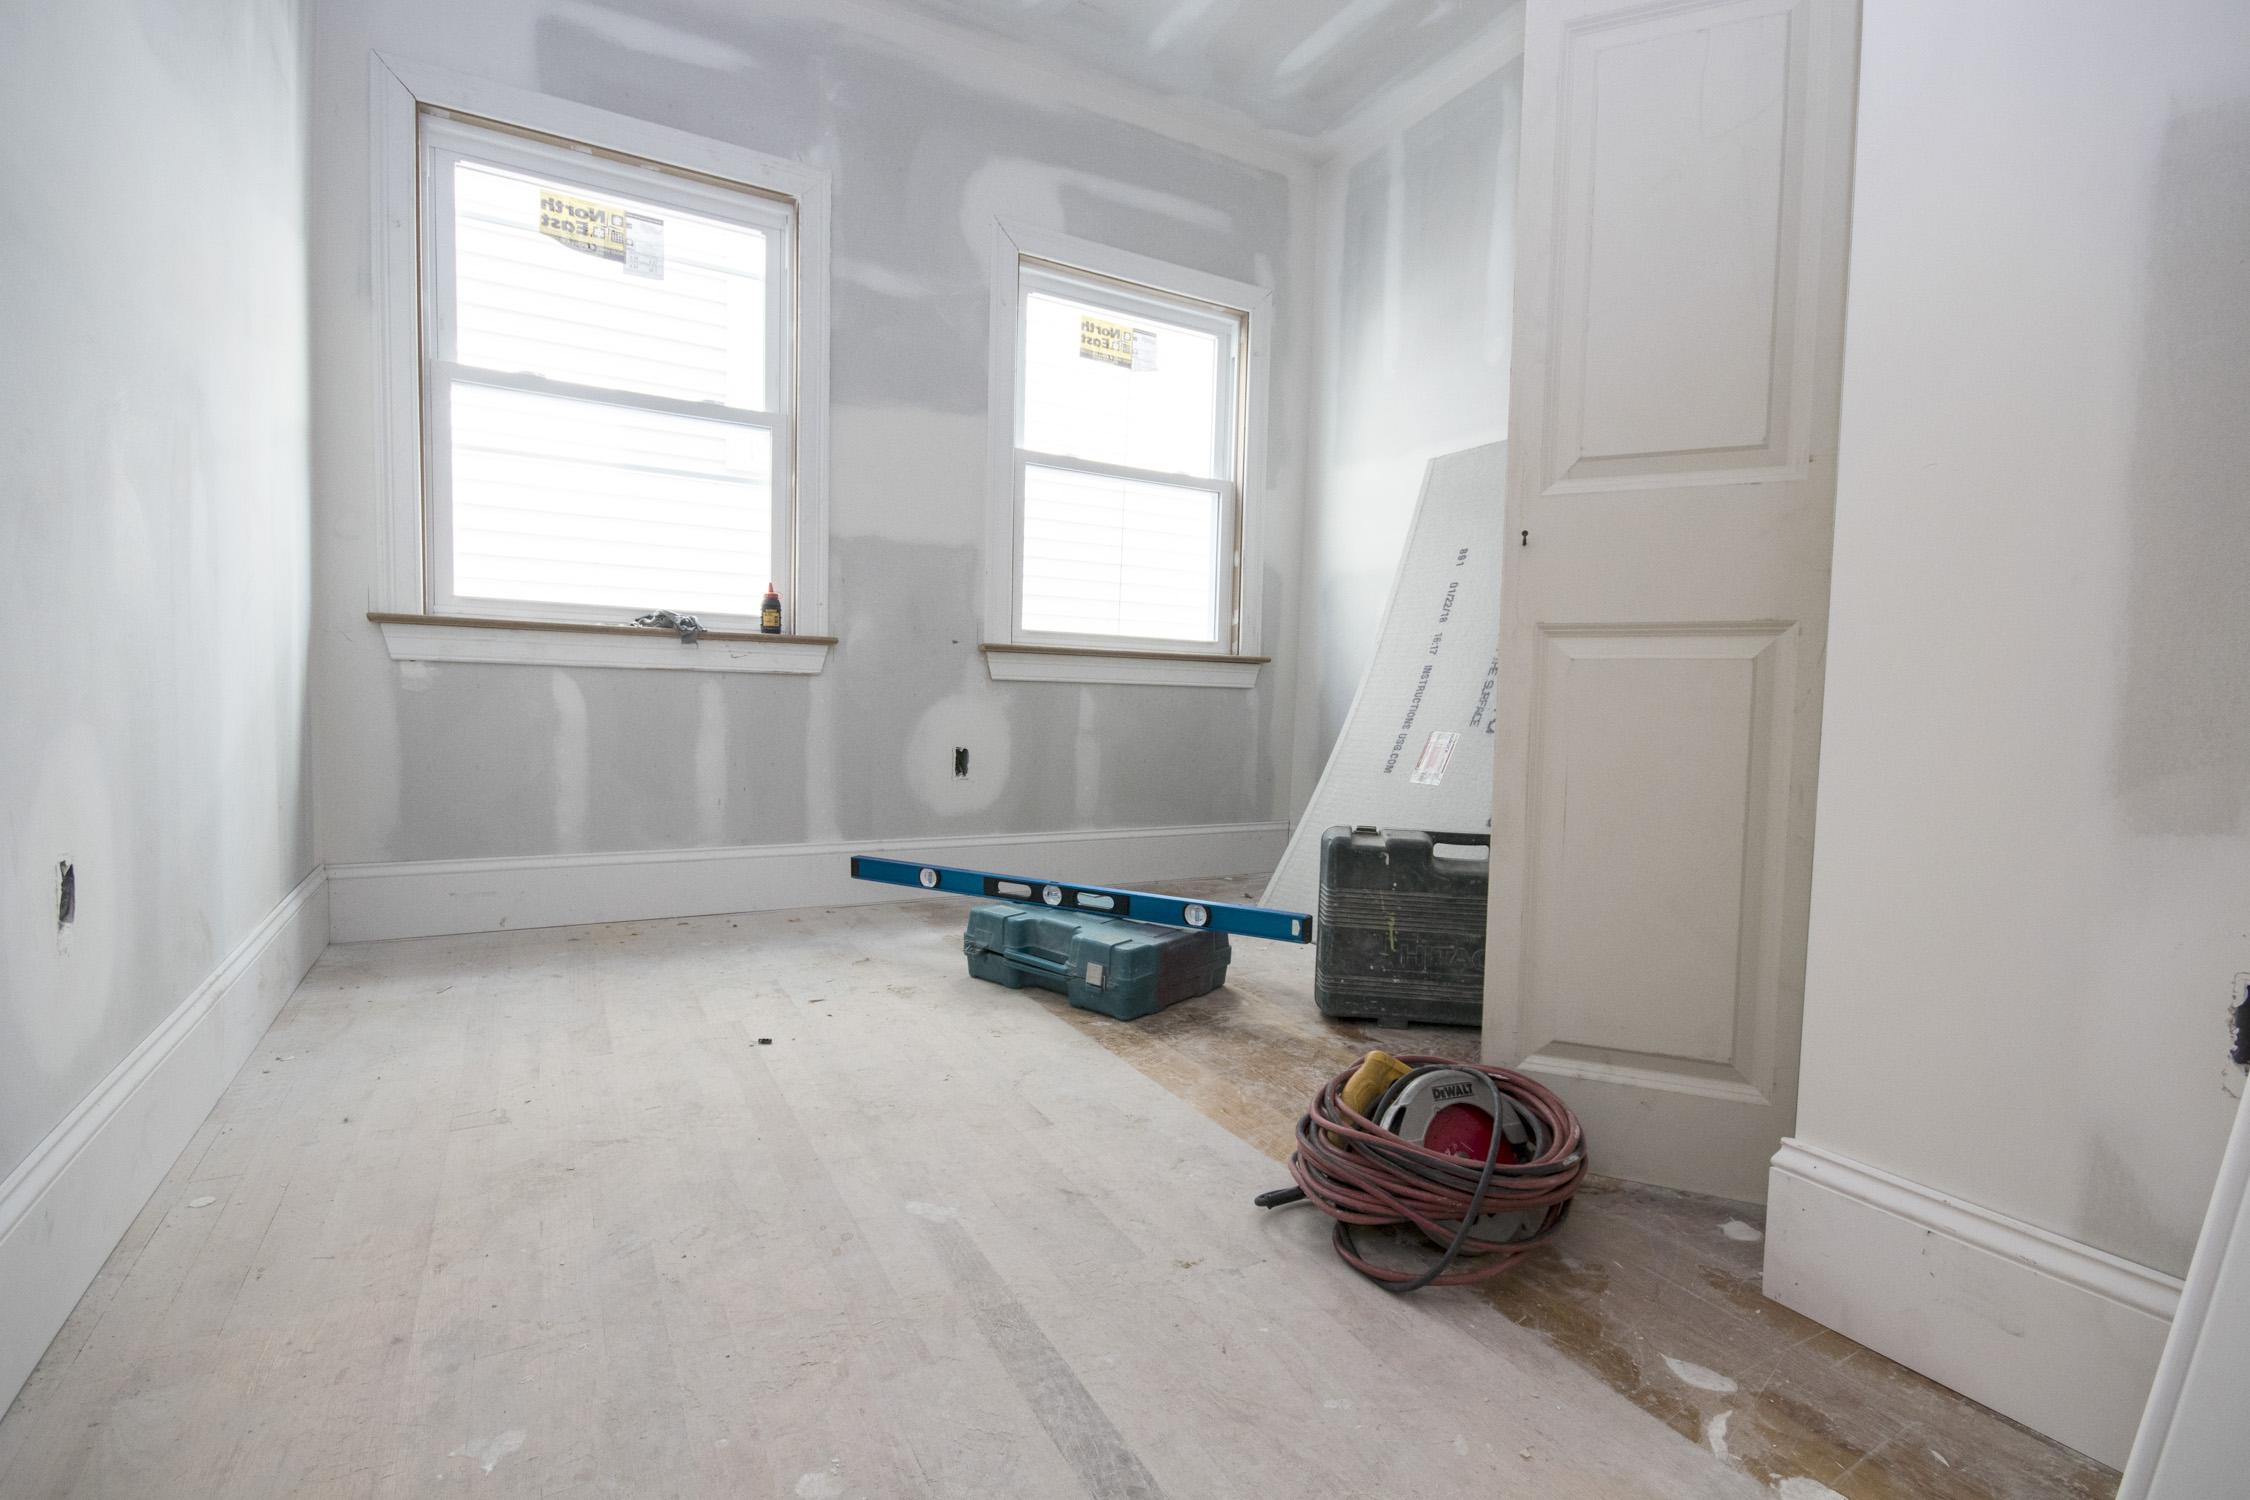 P. Northeast Contractors 27 Darling Street Boston Condo Renovation_120